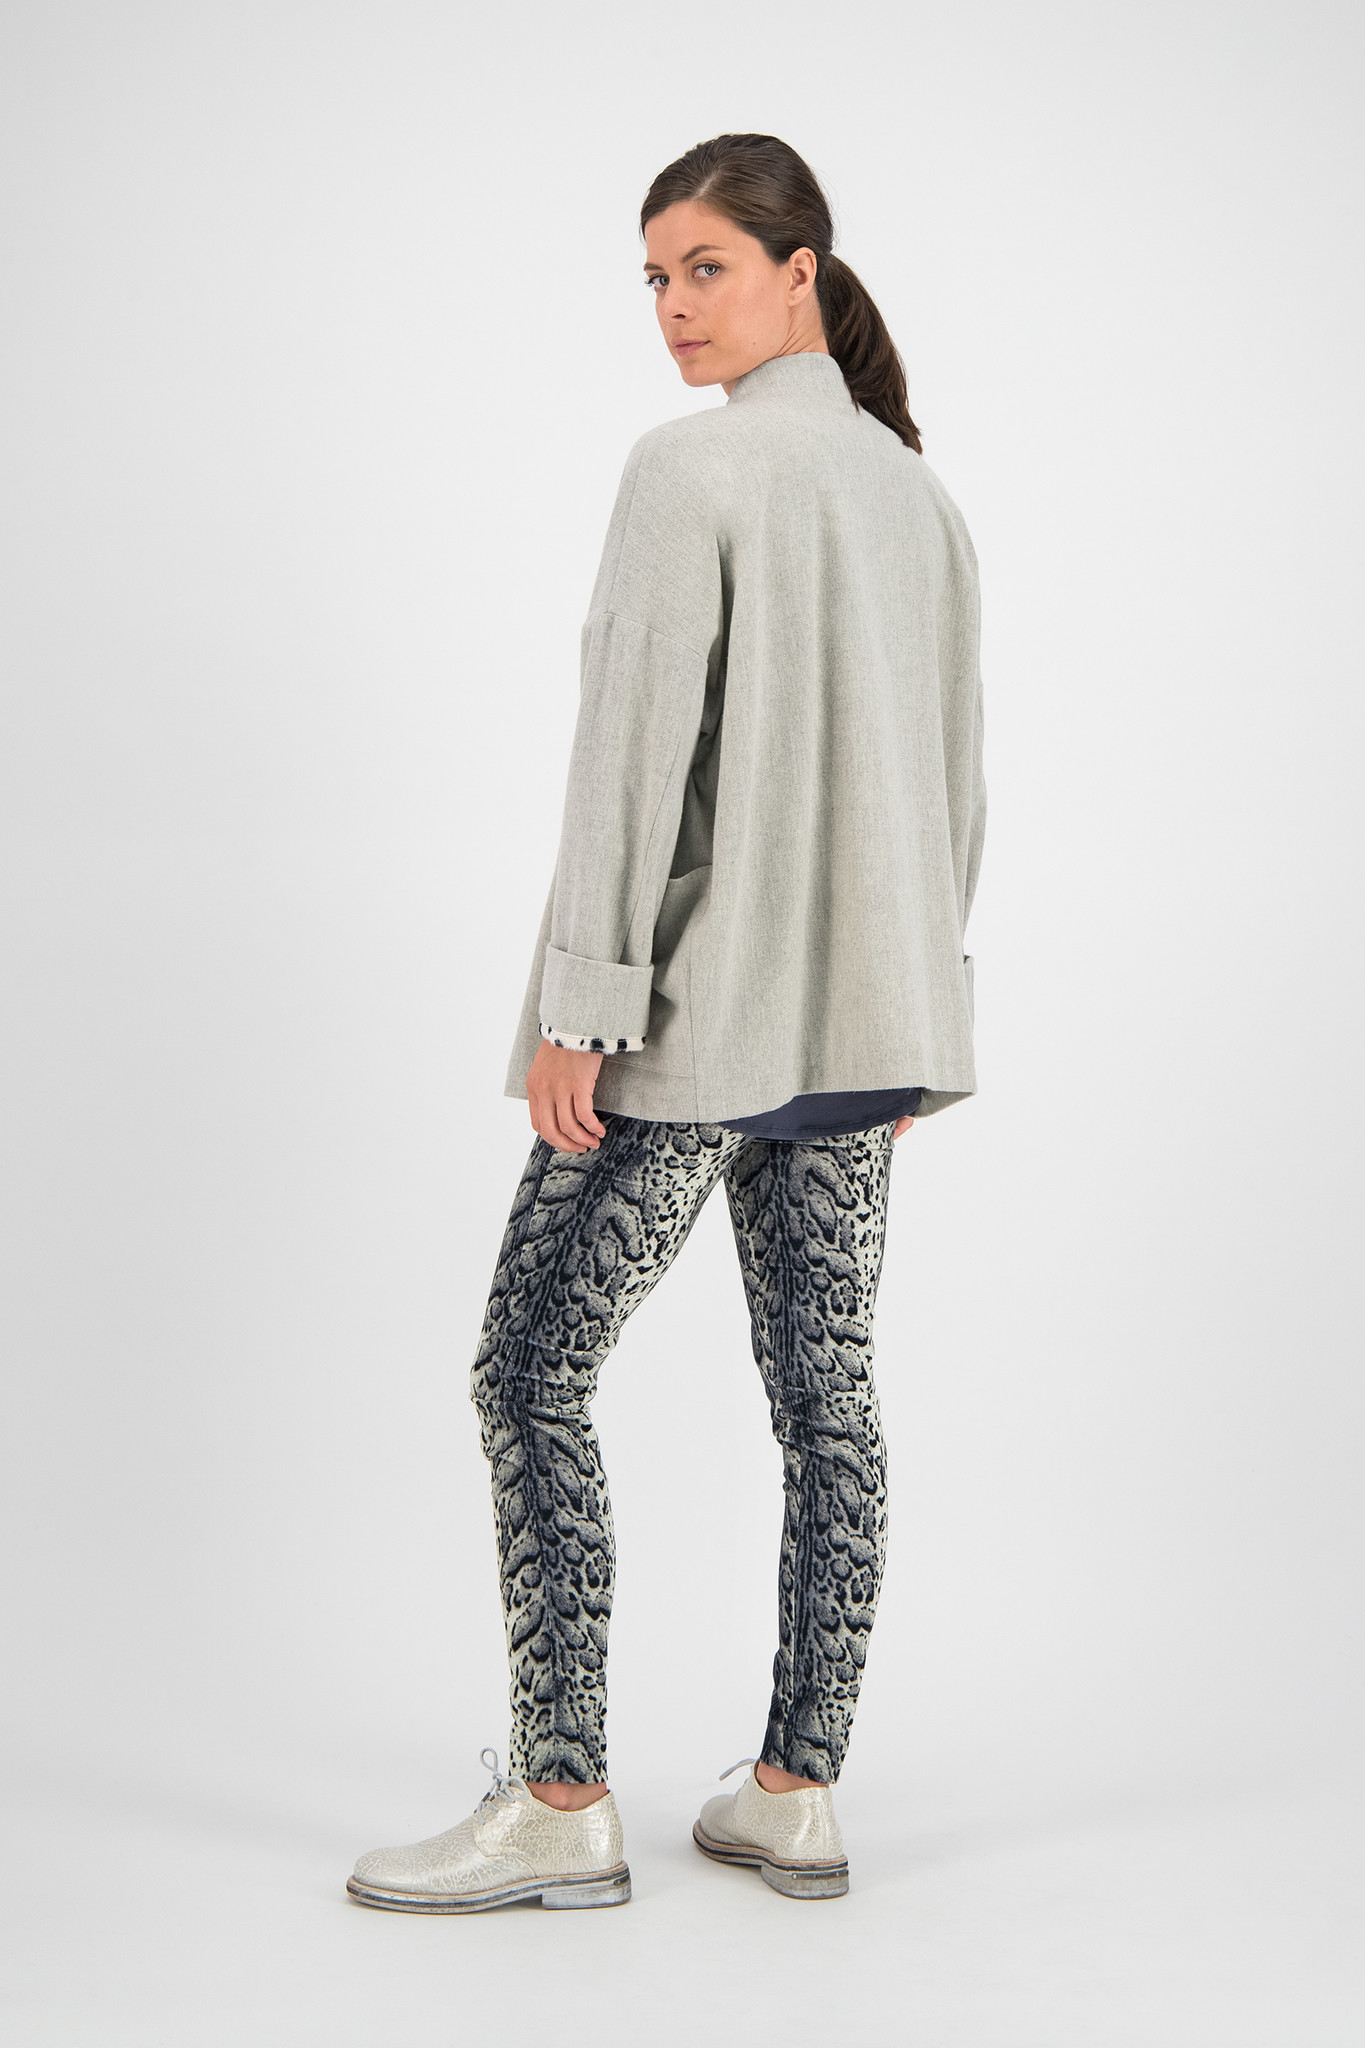 SYLVER Leopard Pants - Light Grey